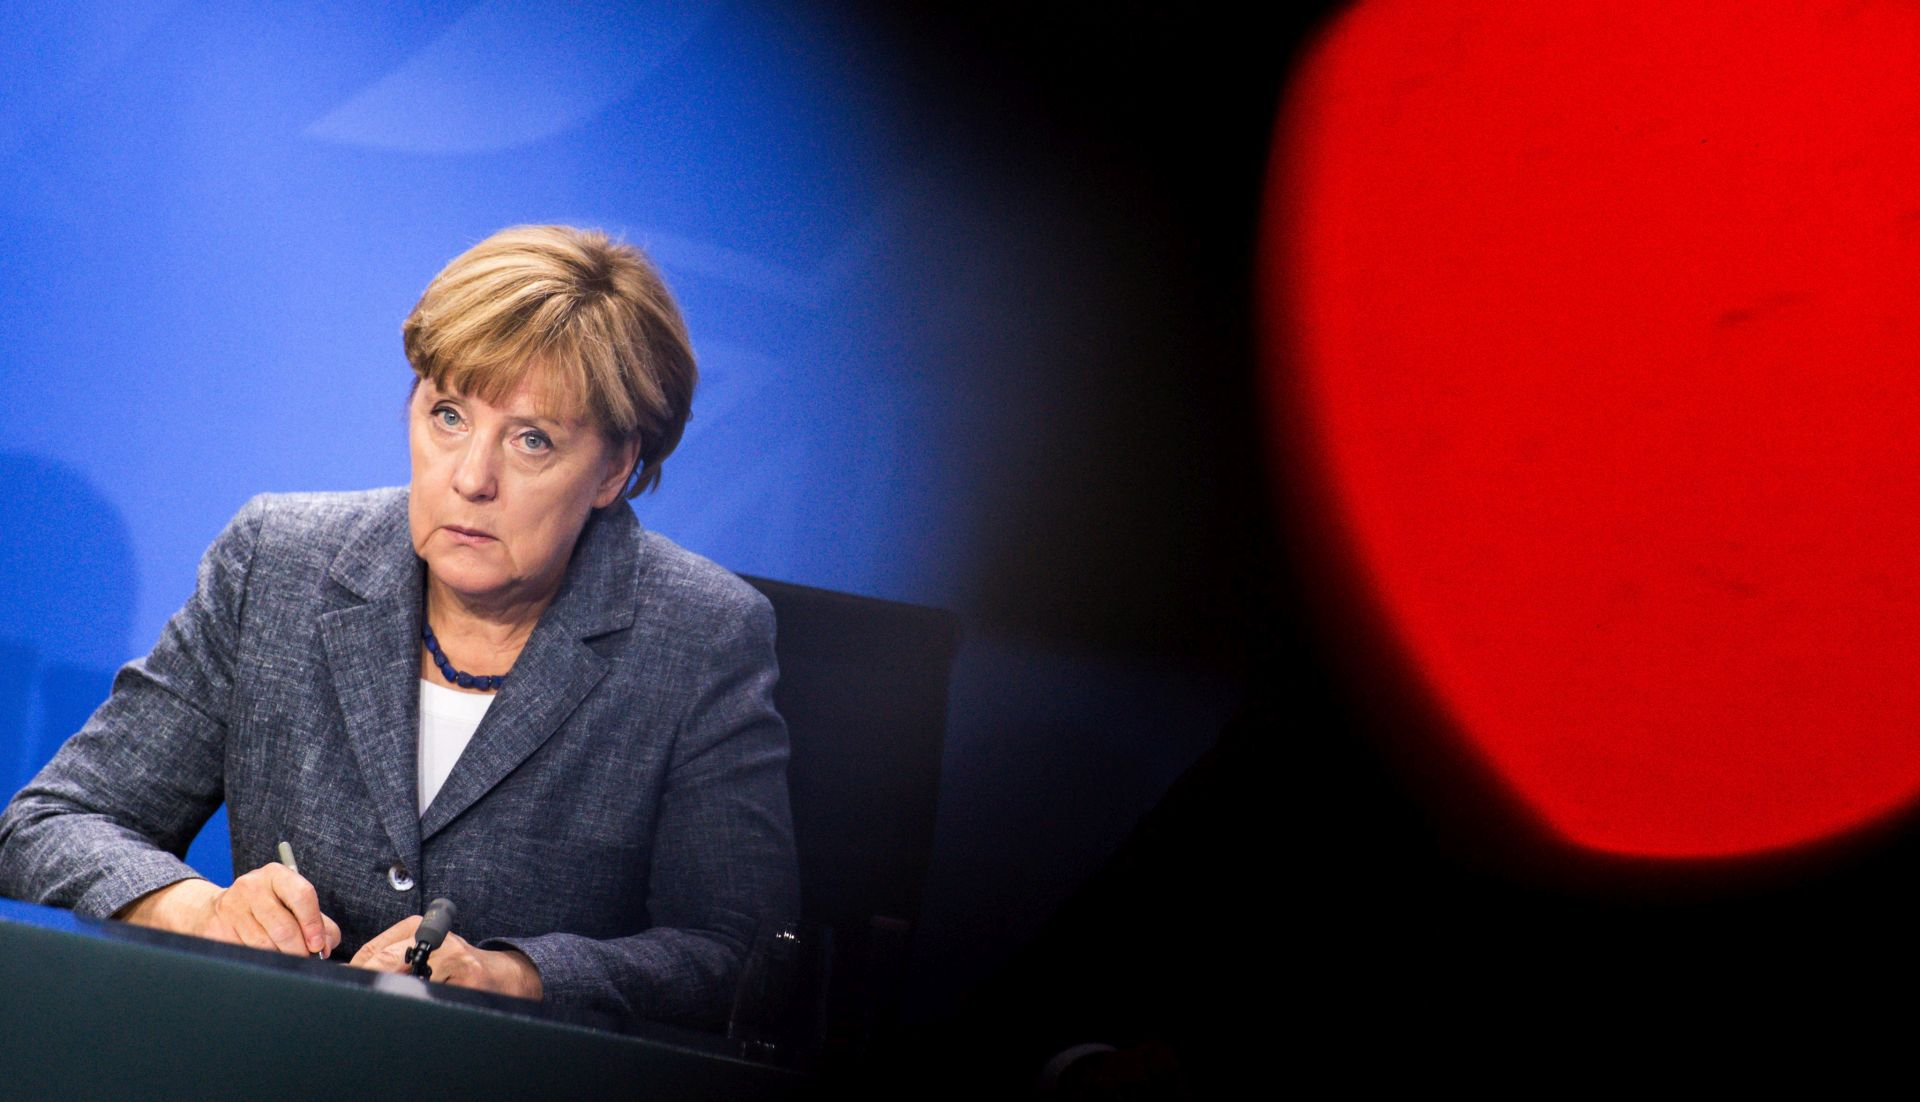 Merkel traži pomoć SAD-a oko izbjeglica, Kongres se opire